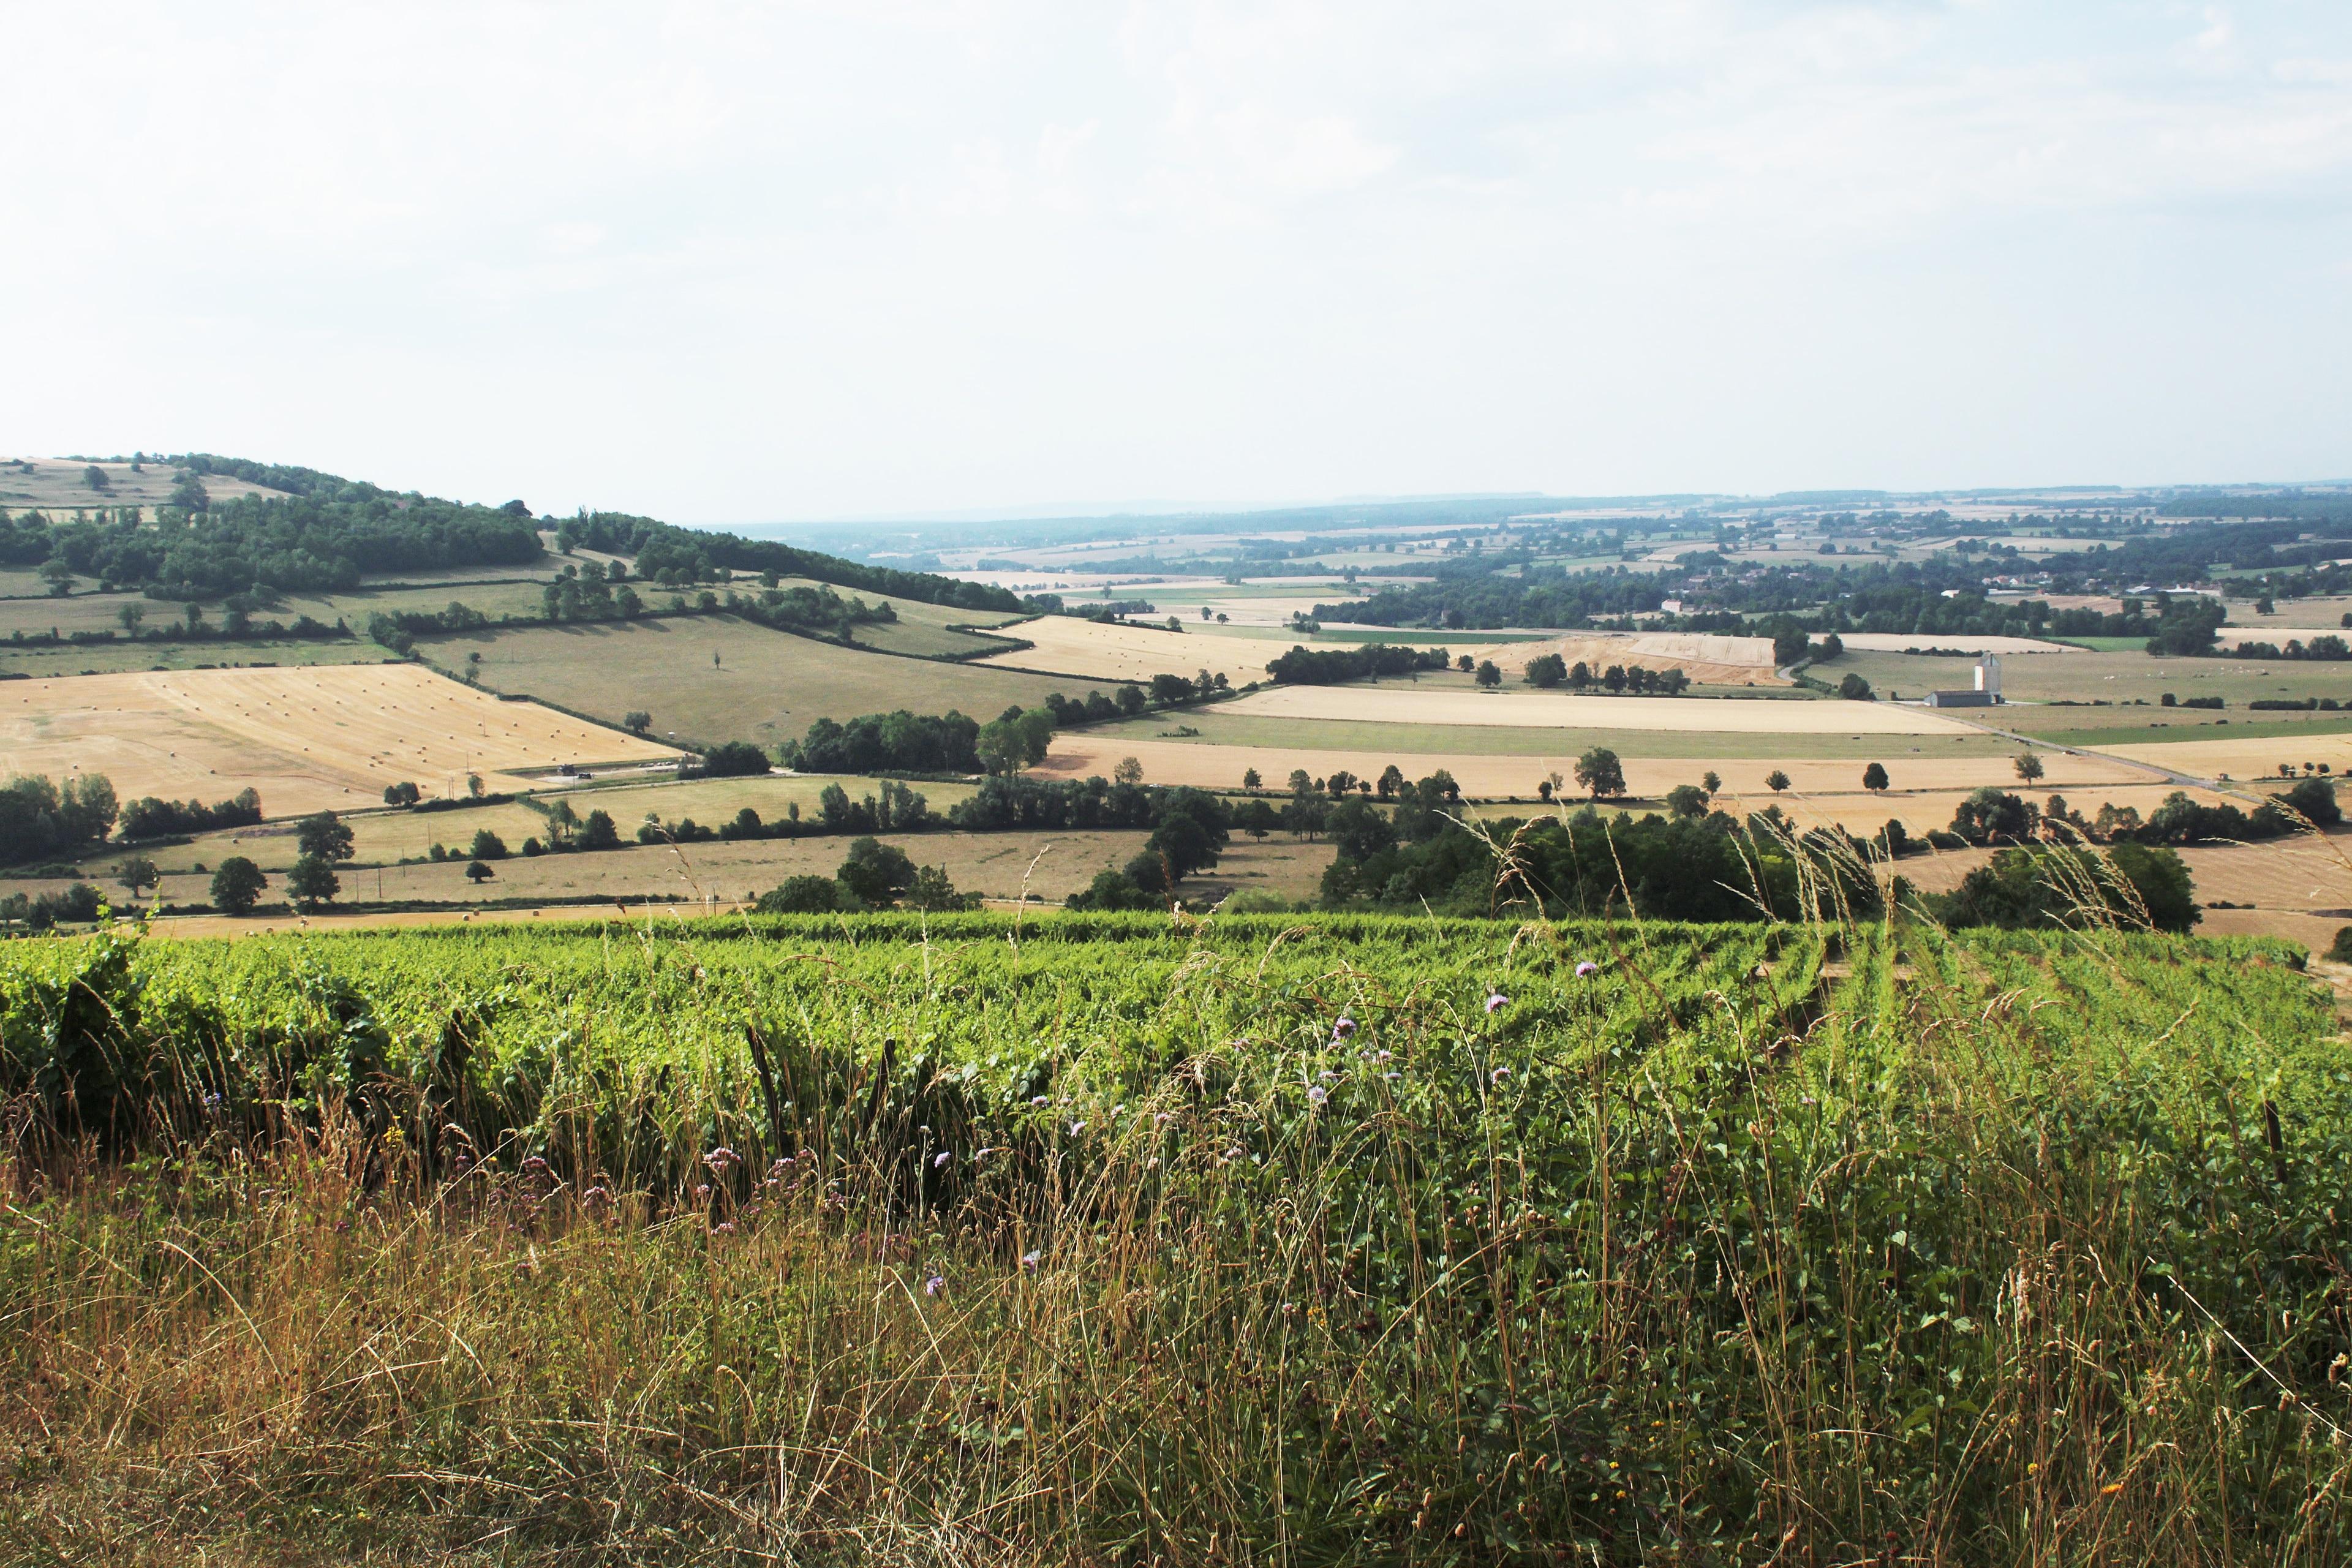 Viserny, Cote d'Or, France